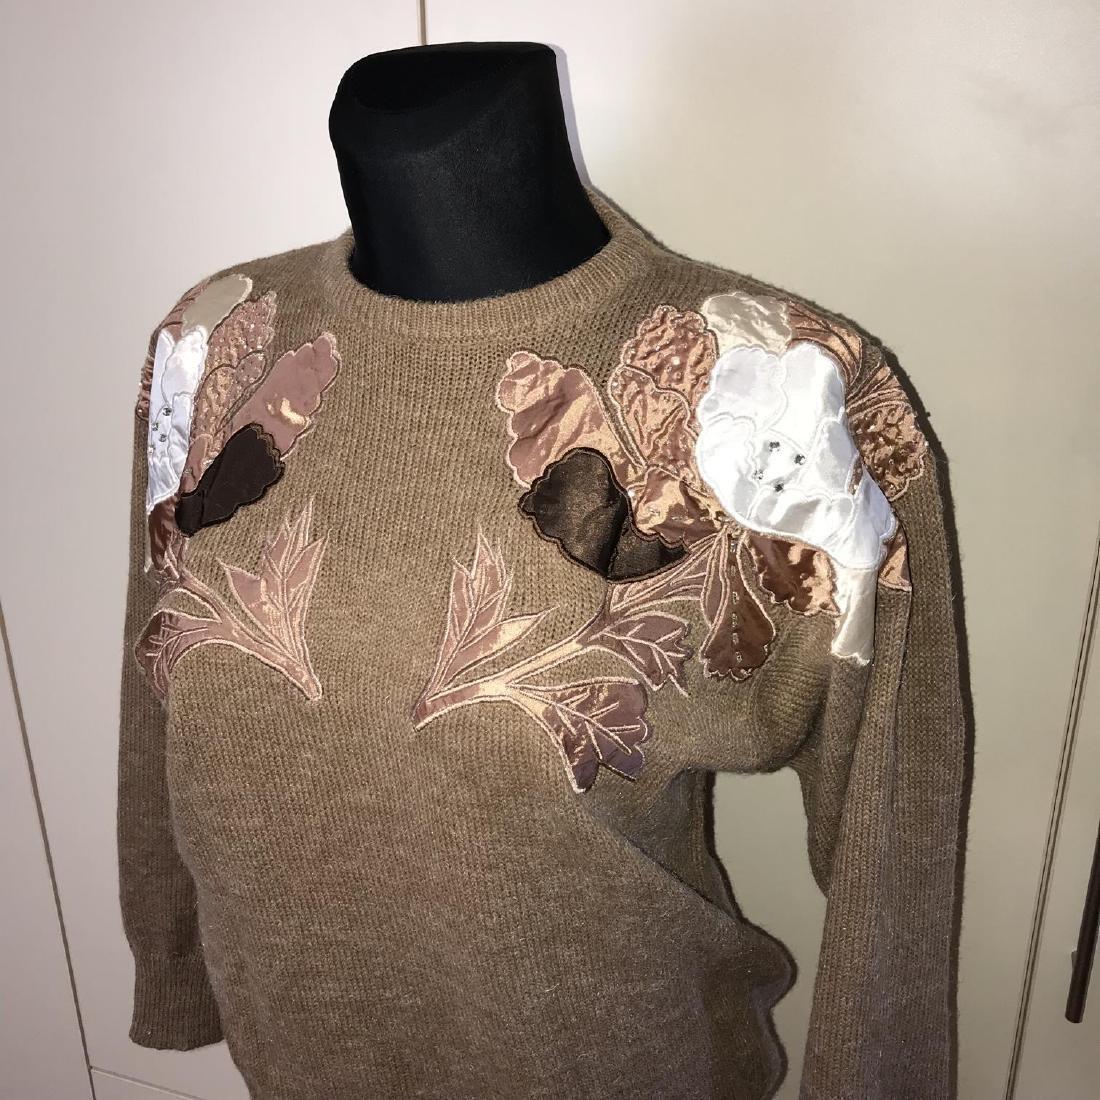 Vintage Women's Oversized Sweater Size EUR 40 US 10 - 2